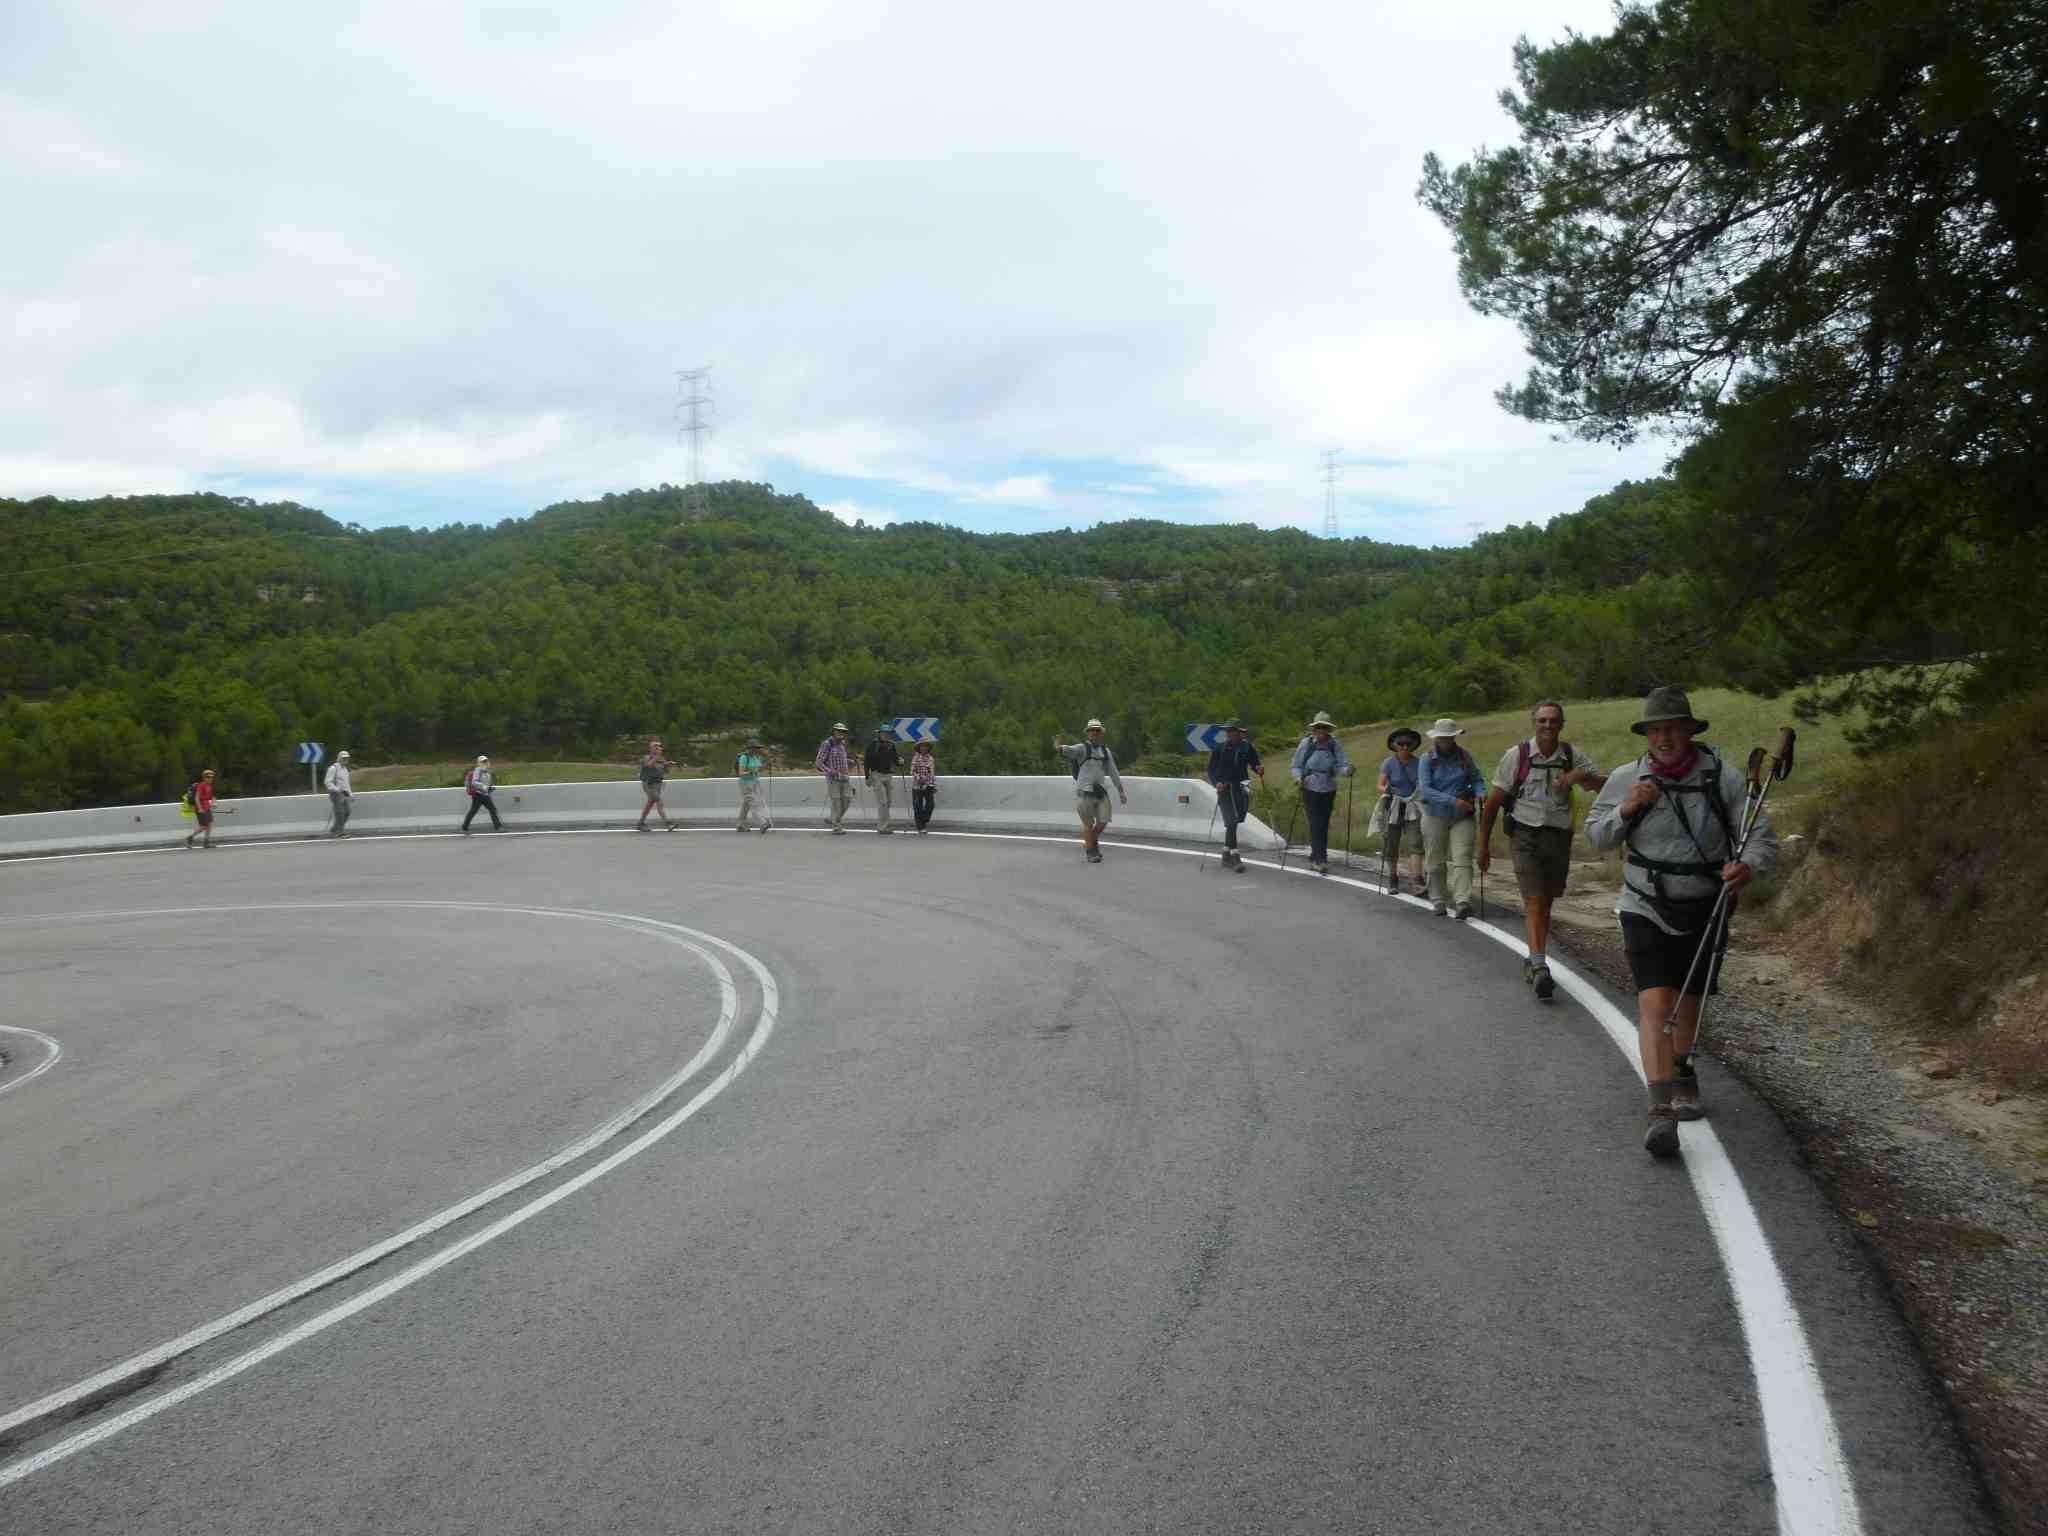 Stage 25: Igualada – Montserrat (26.8 km) | Walking with ...